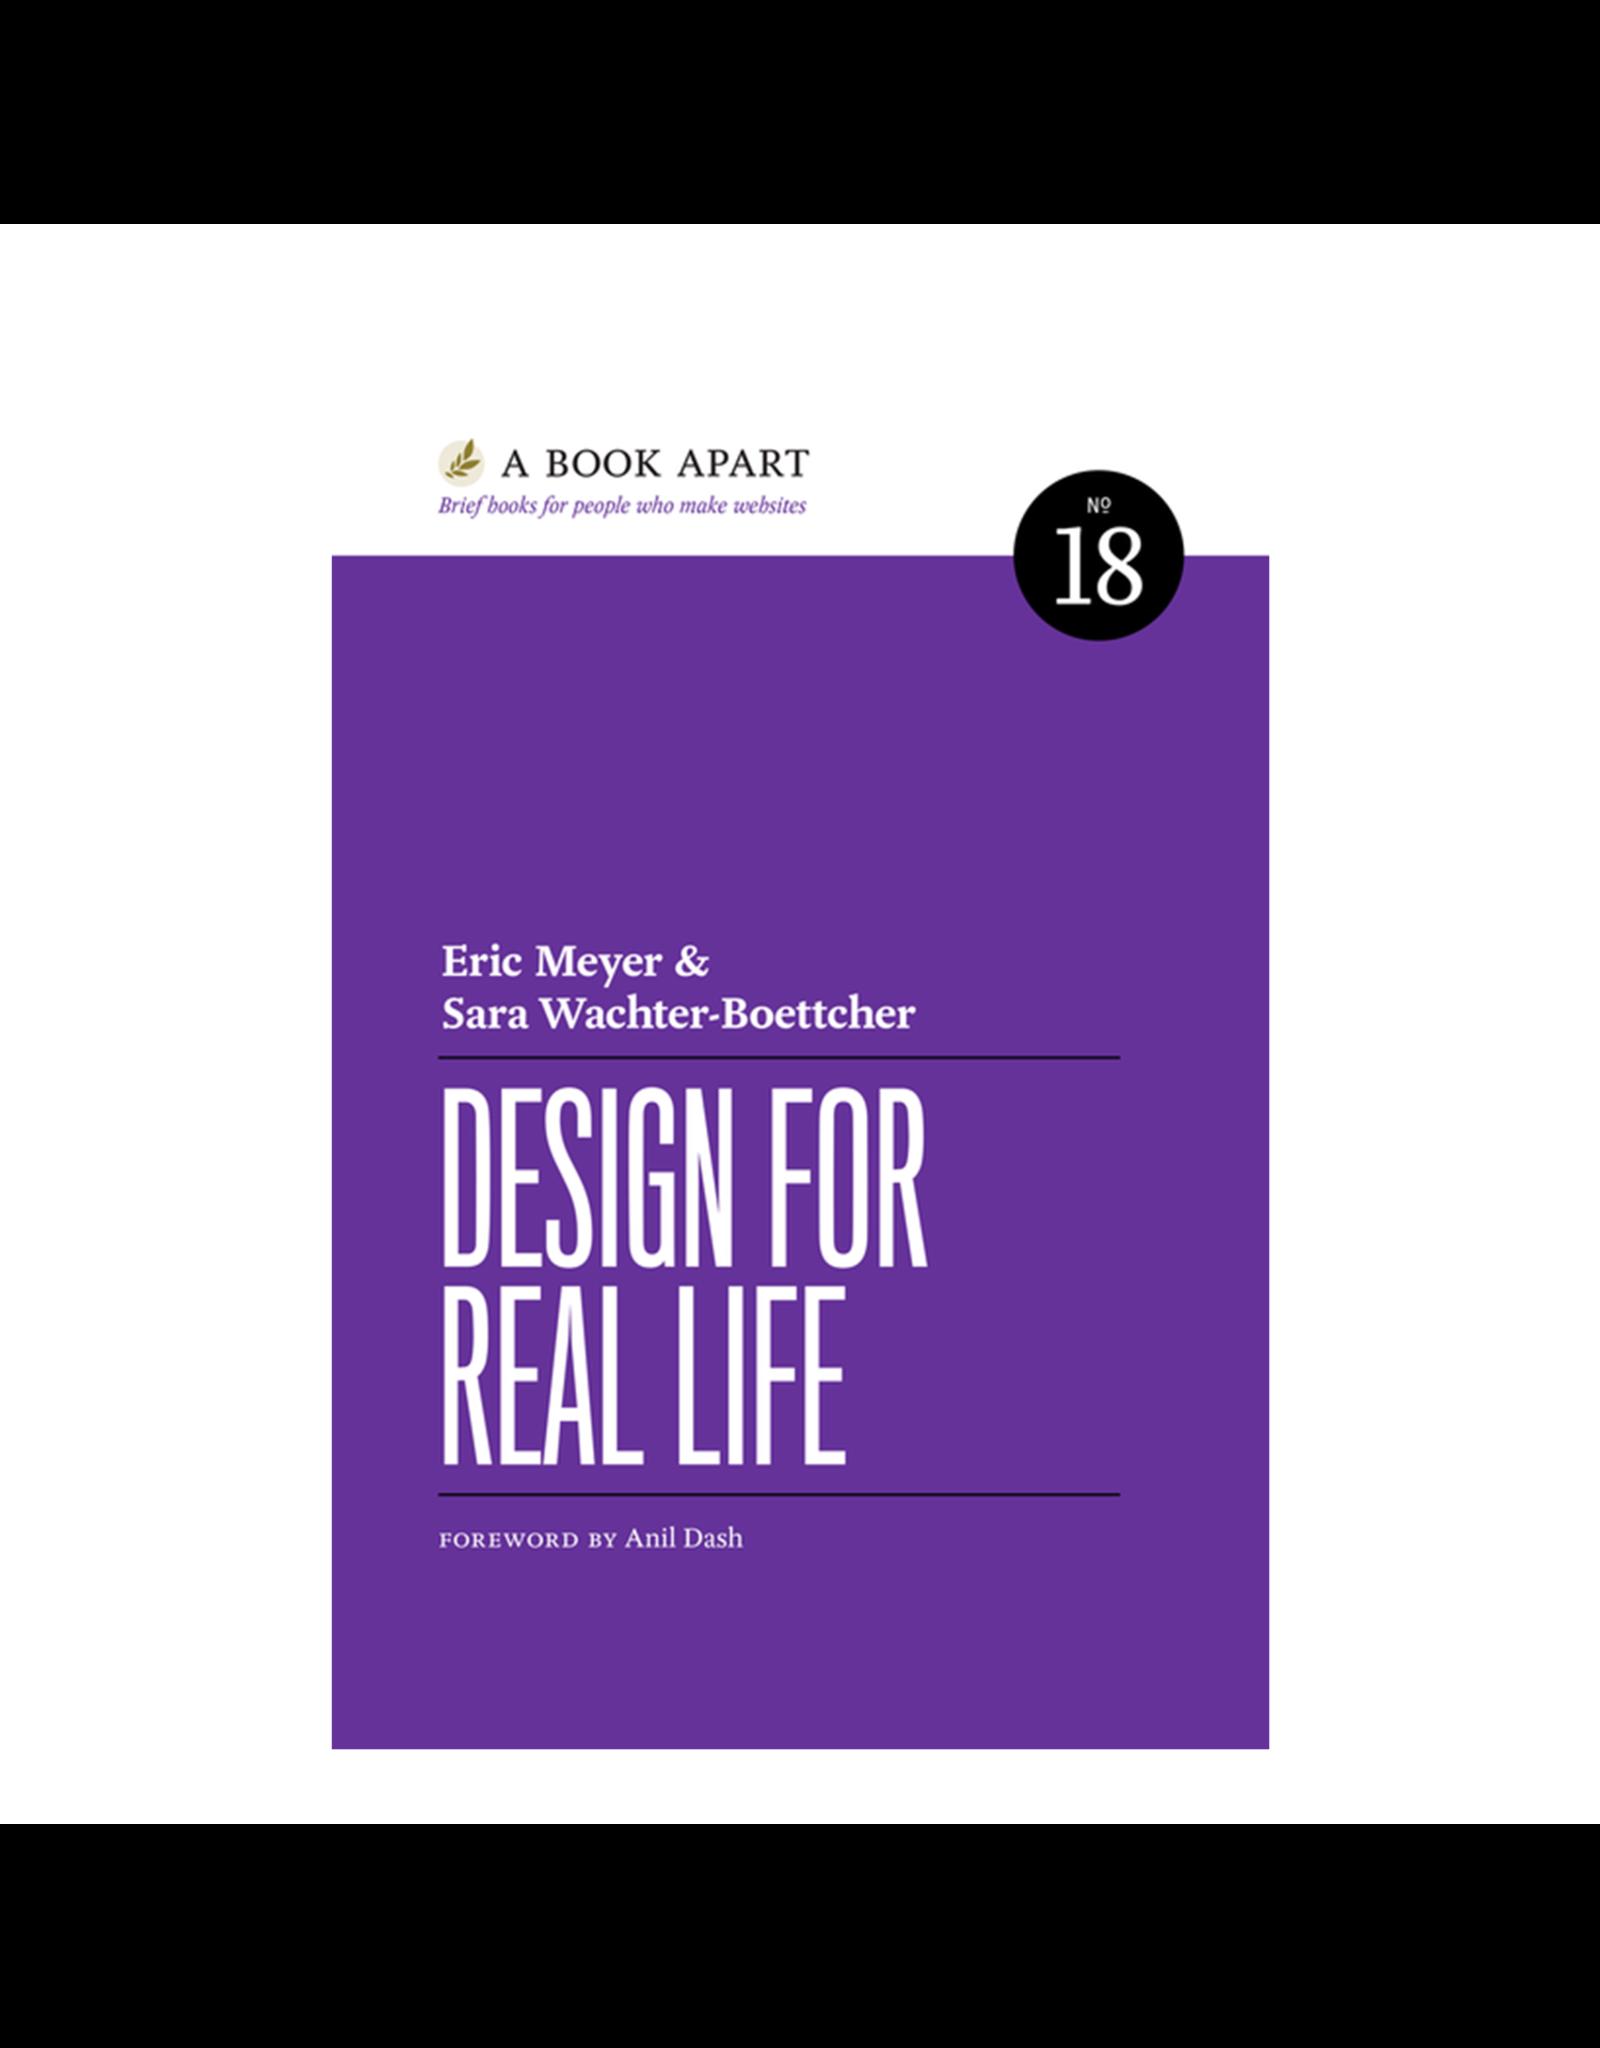 A Book Apart: Design for Real Life (No. 18)